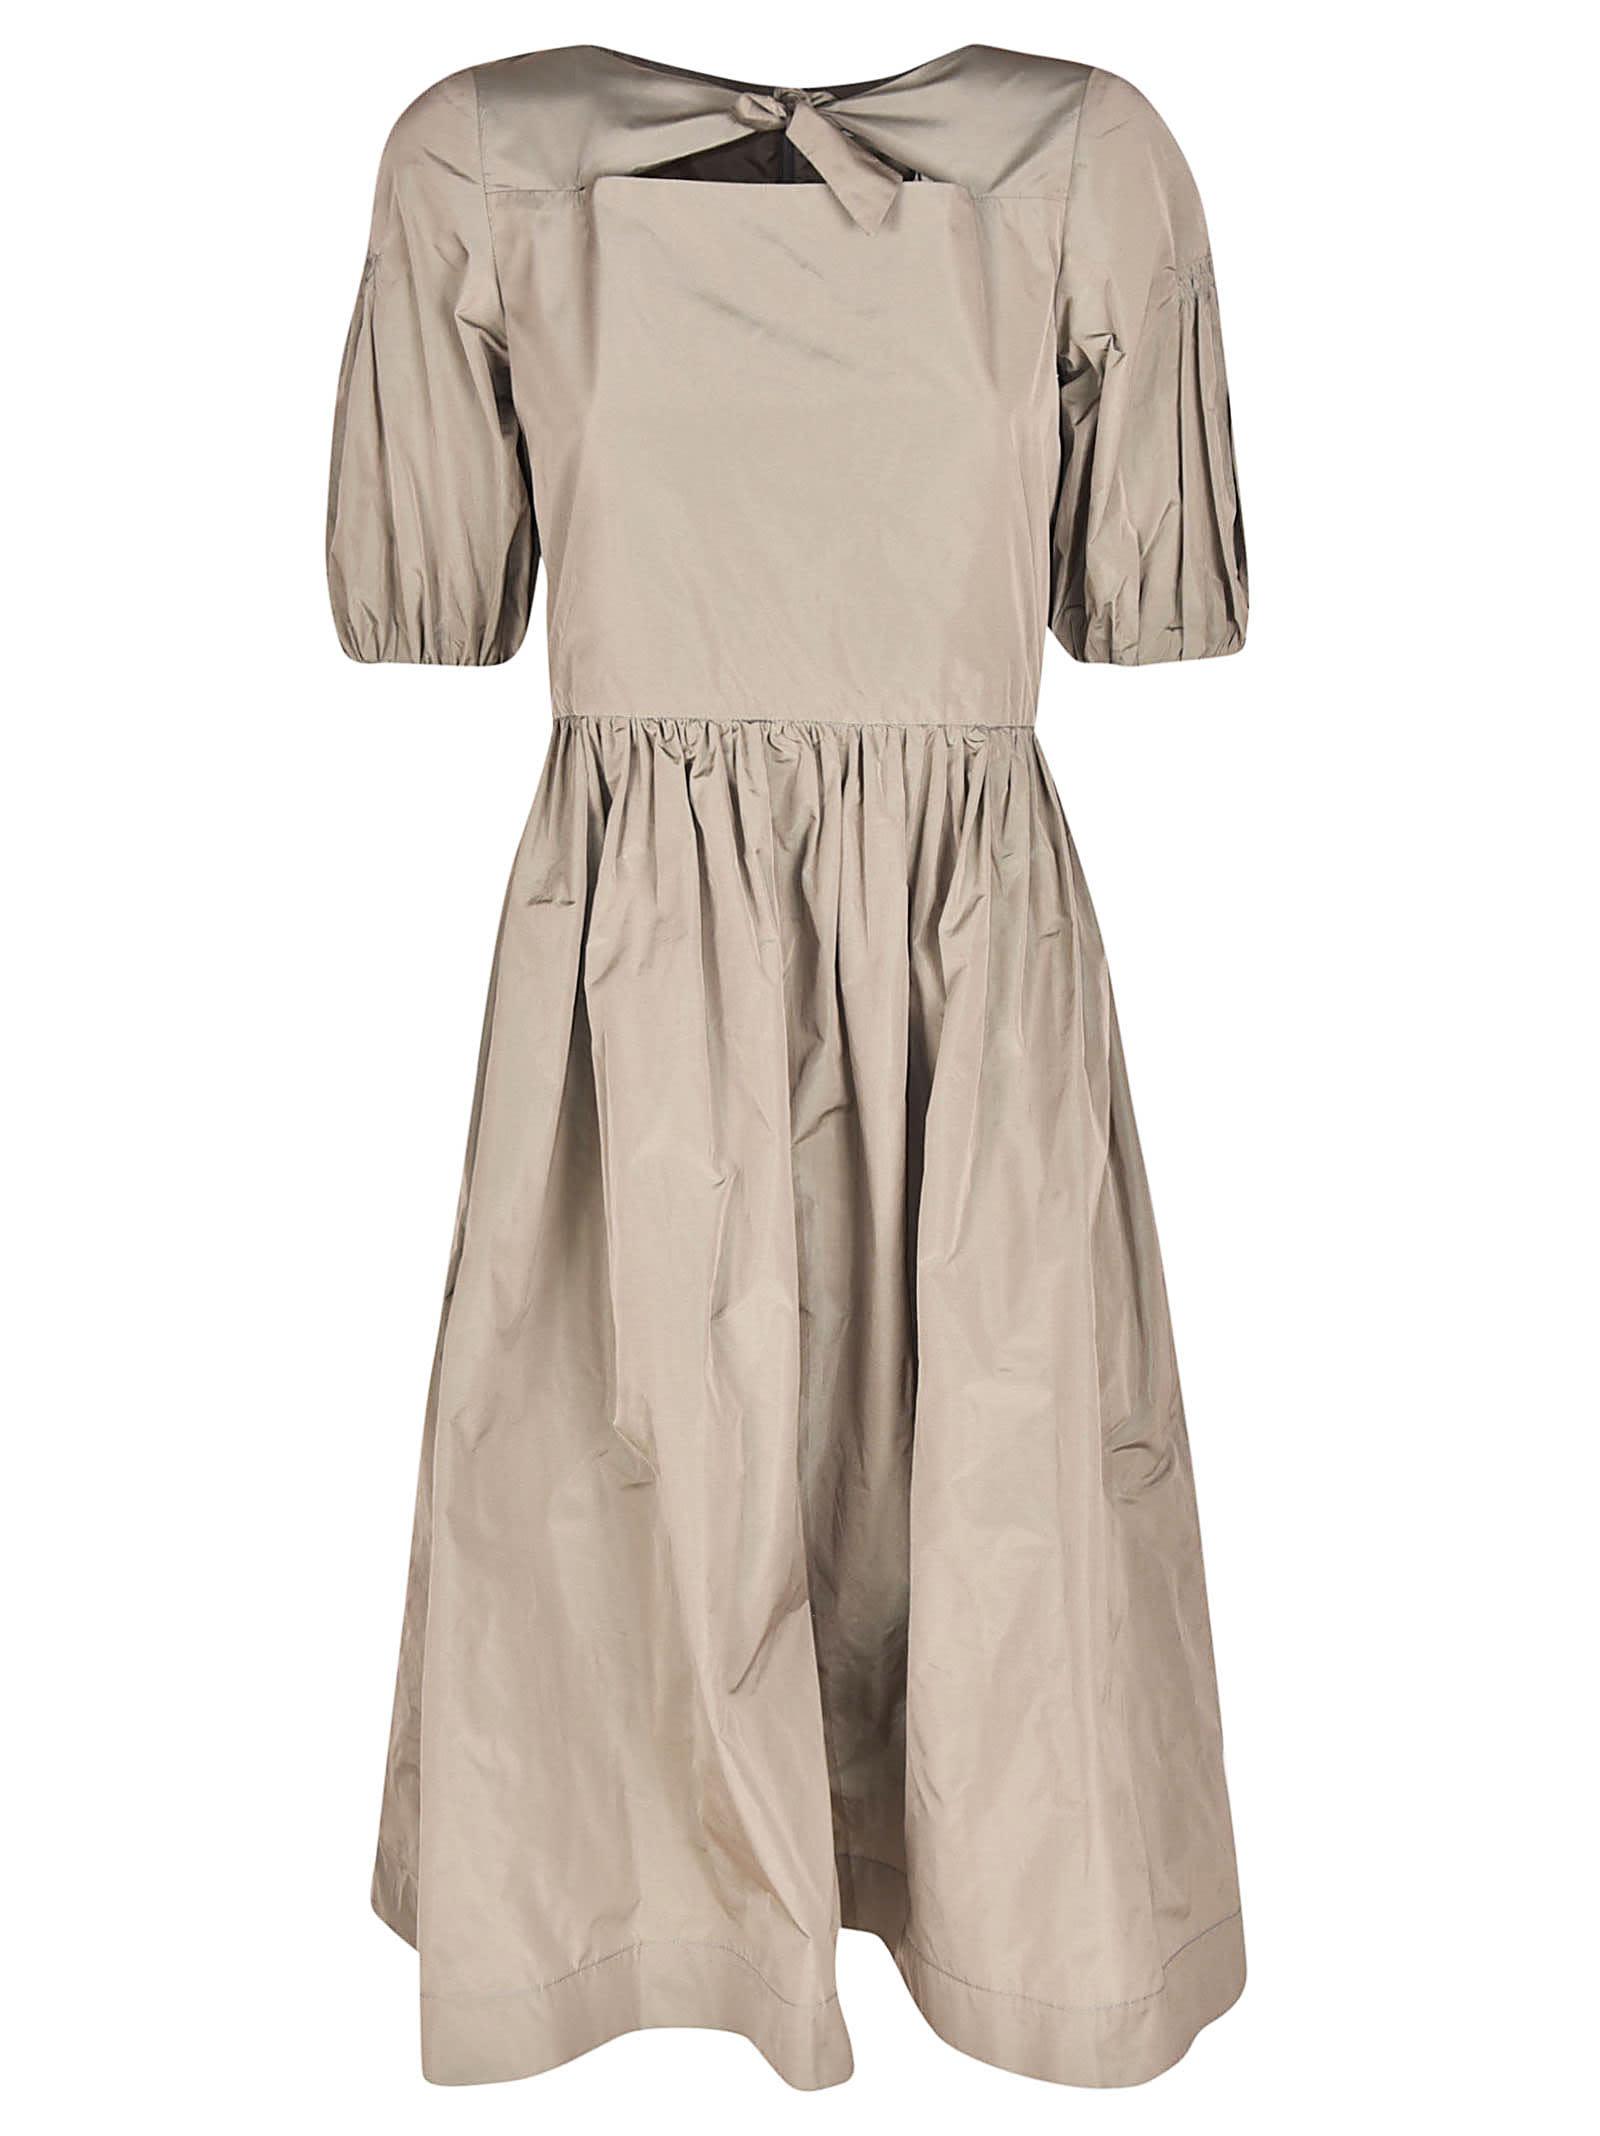 Molly Goddard Ruffled Dress